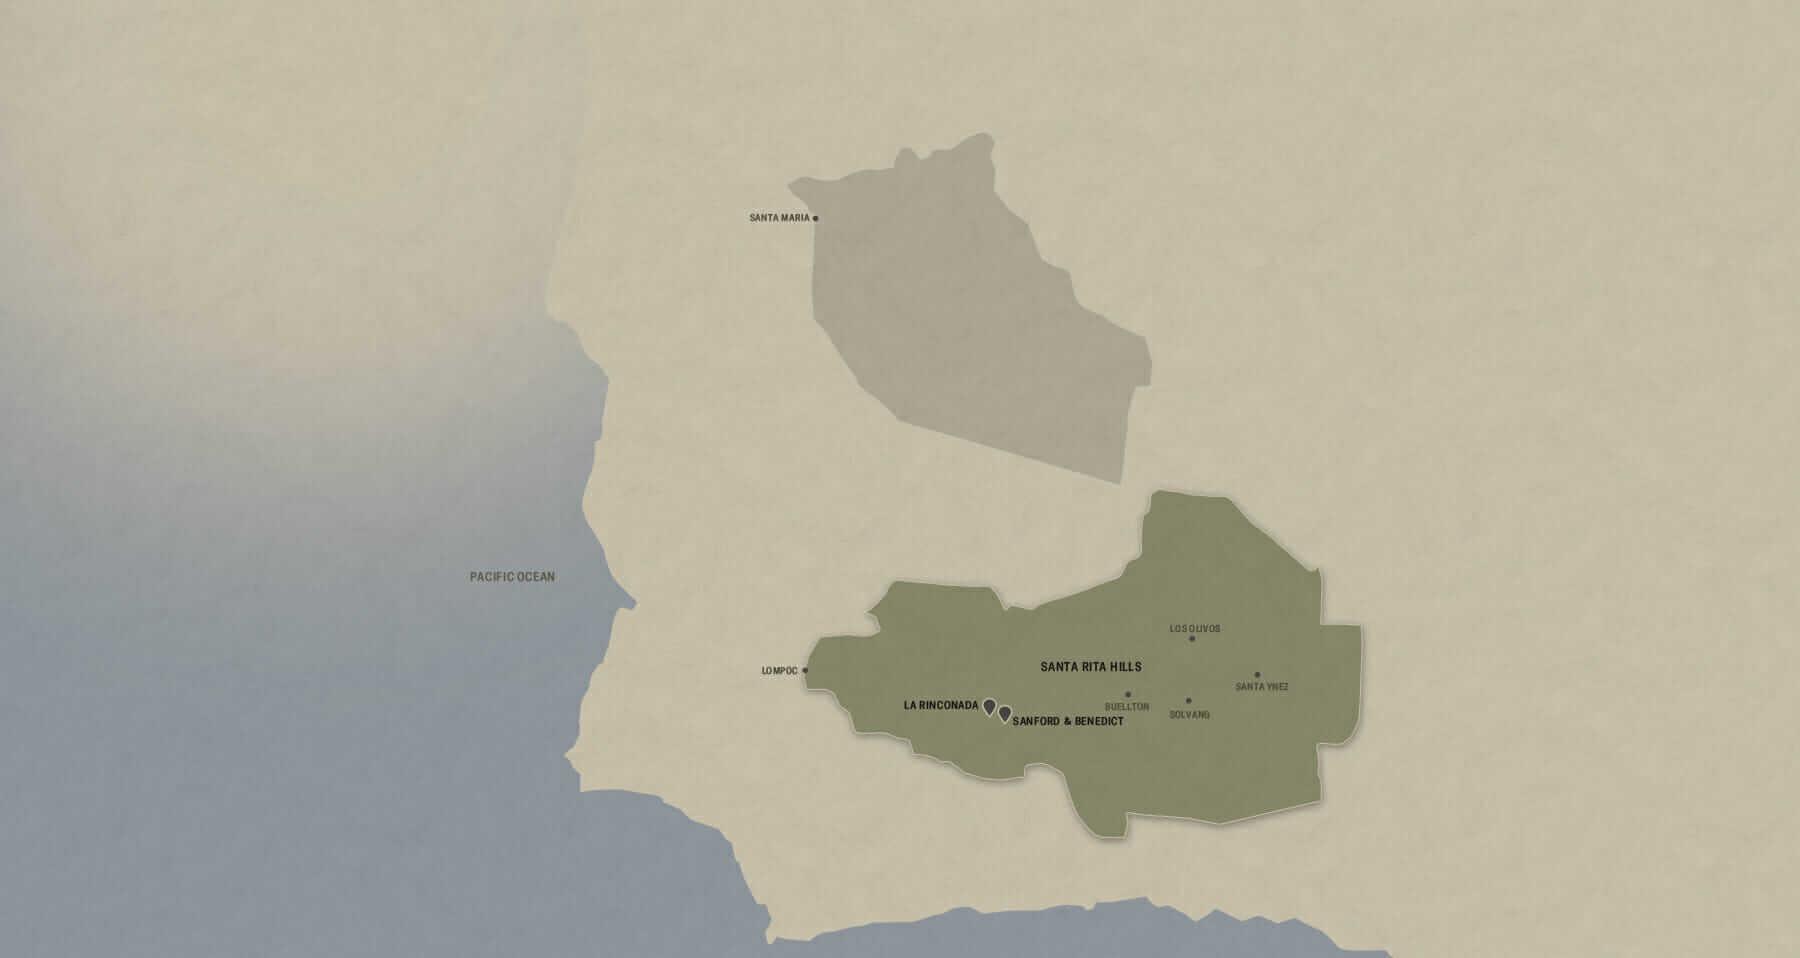 Map of Santa Barbara County AVA with the Santa Rita Hills sub AVA highlighted